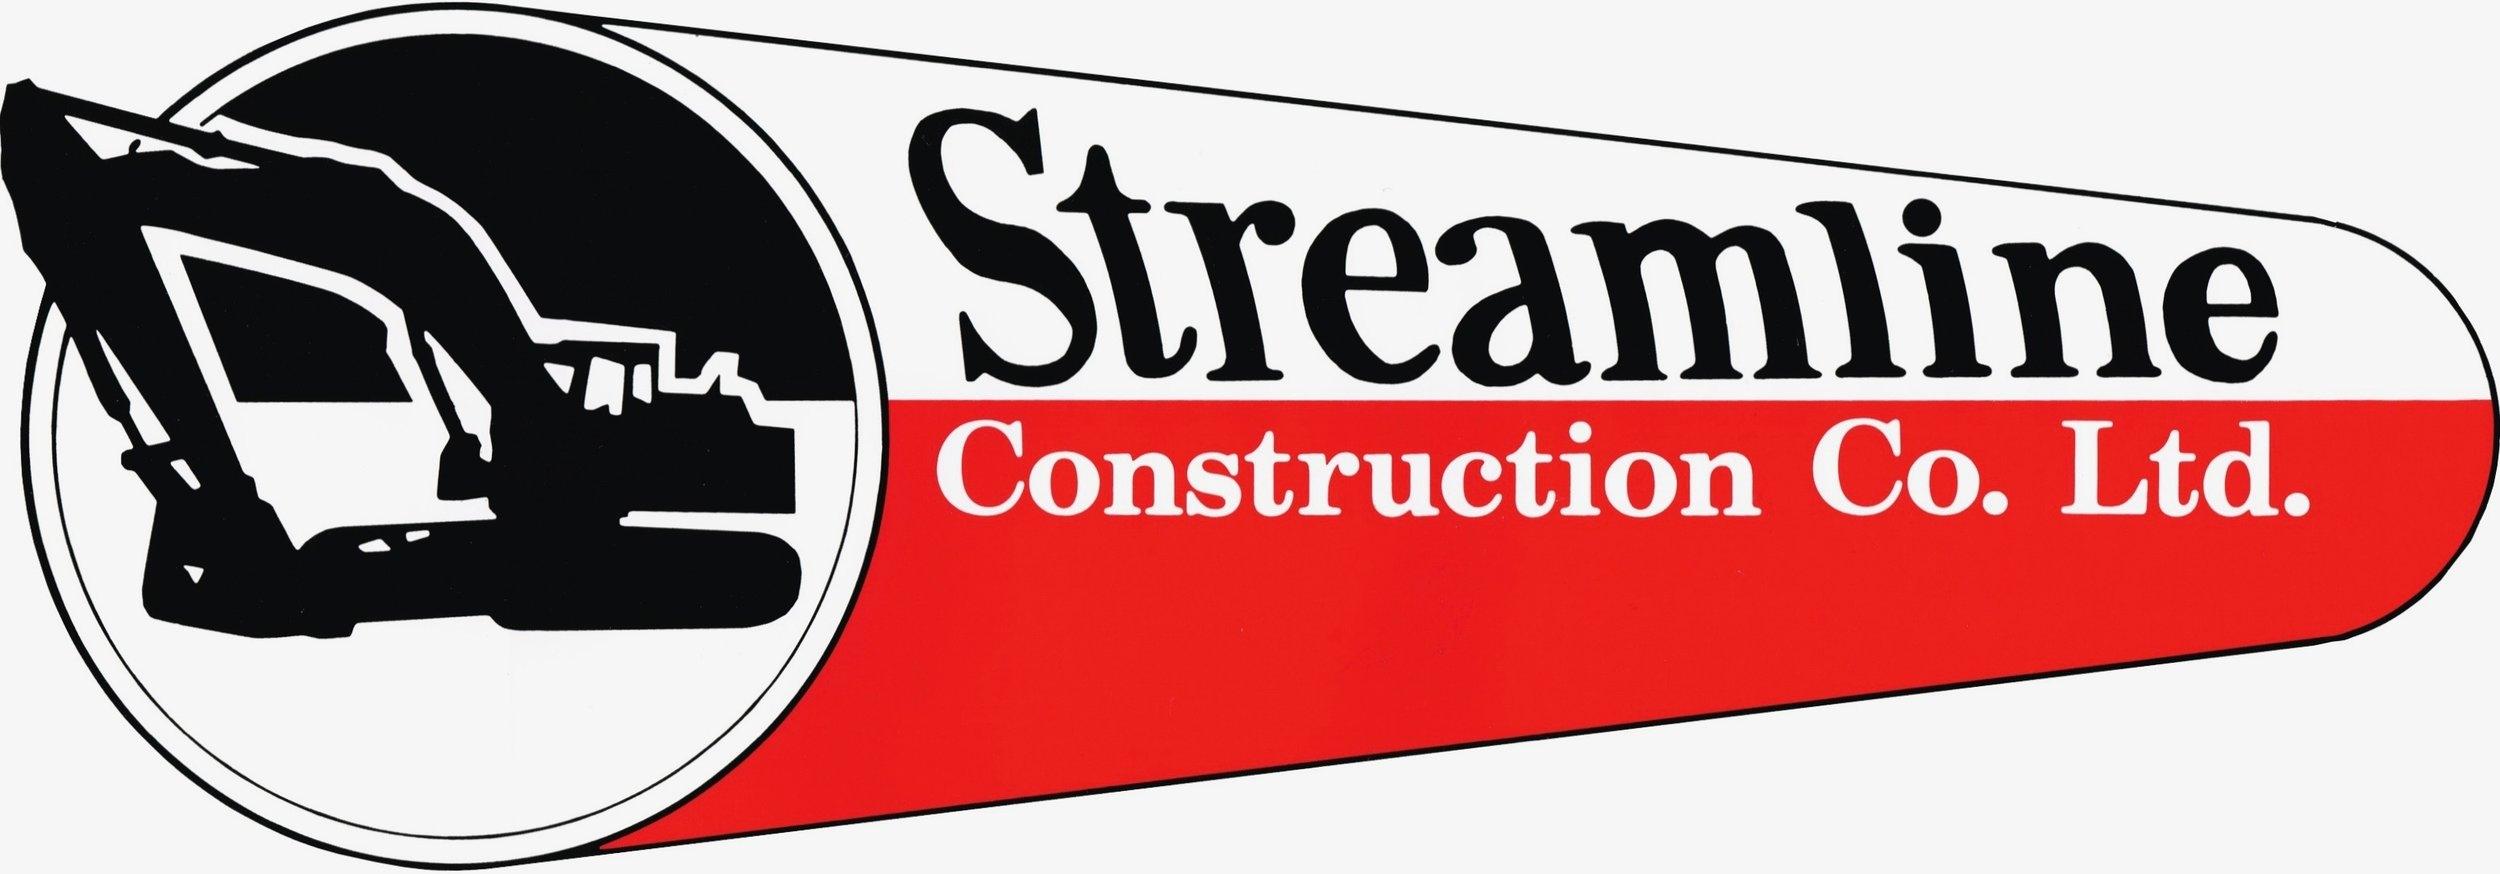 Streamline Logo.jpg